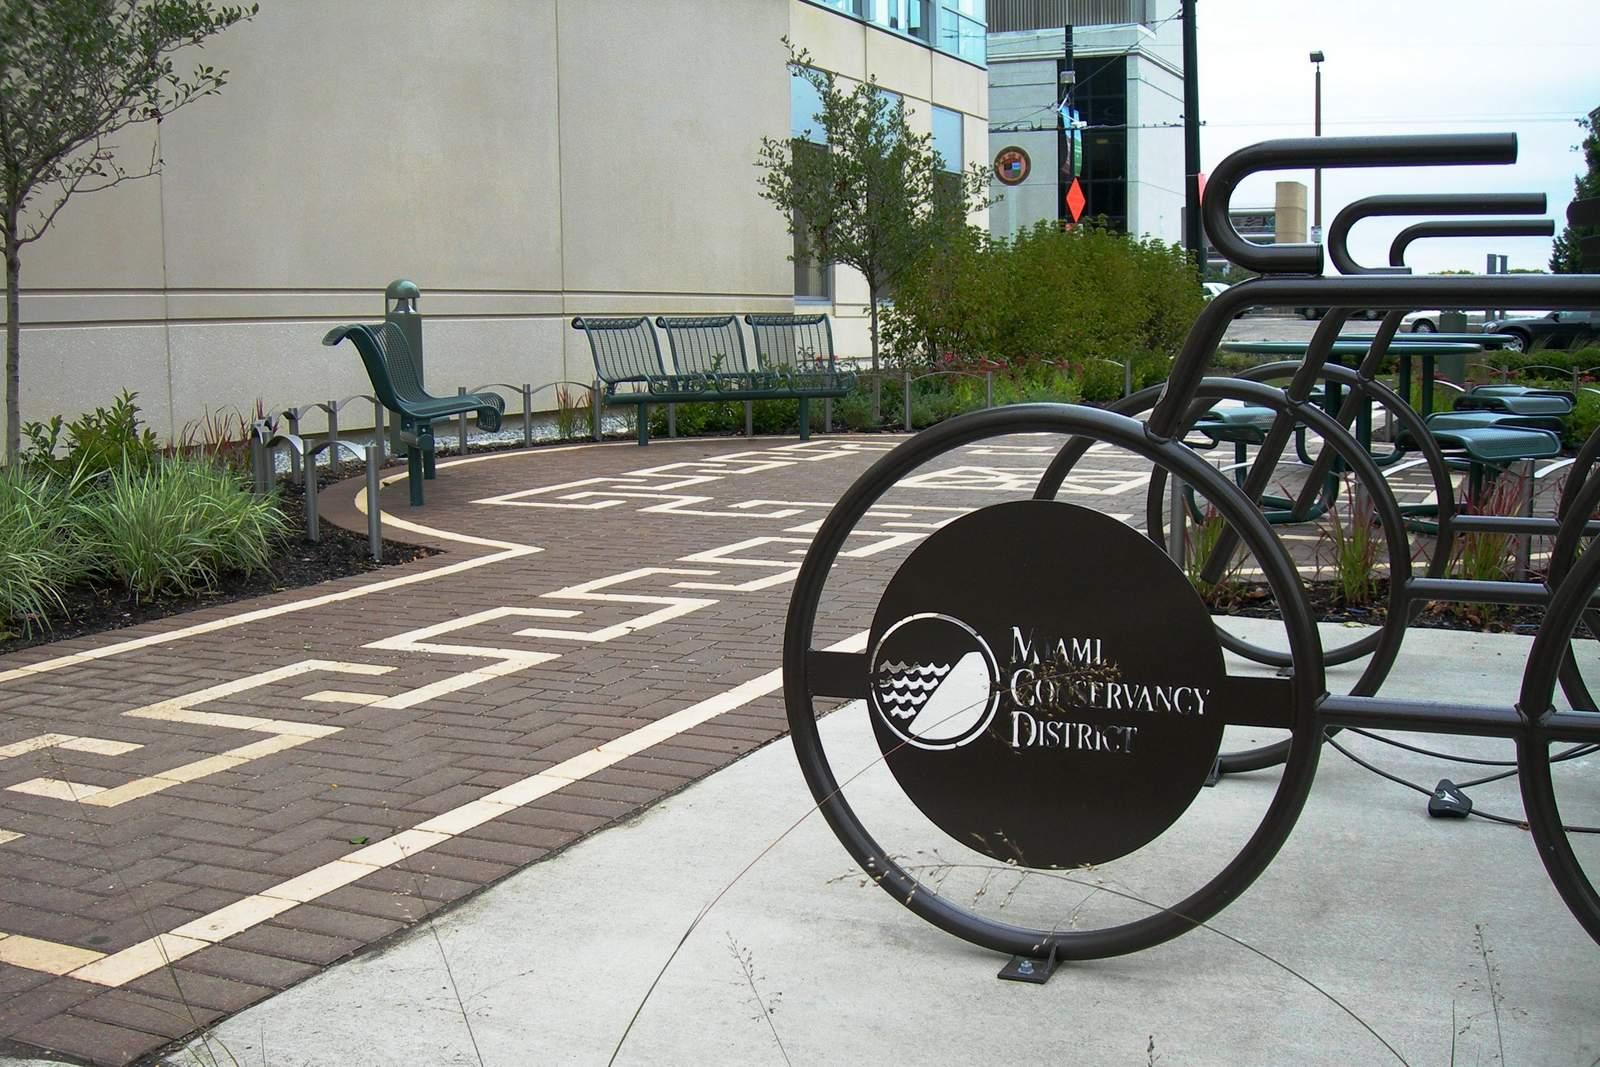 Miami Conservancy District - Dayton